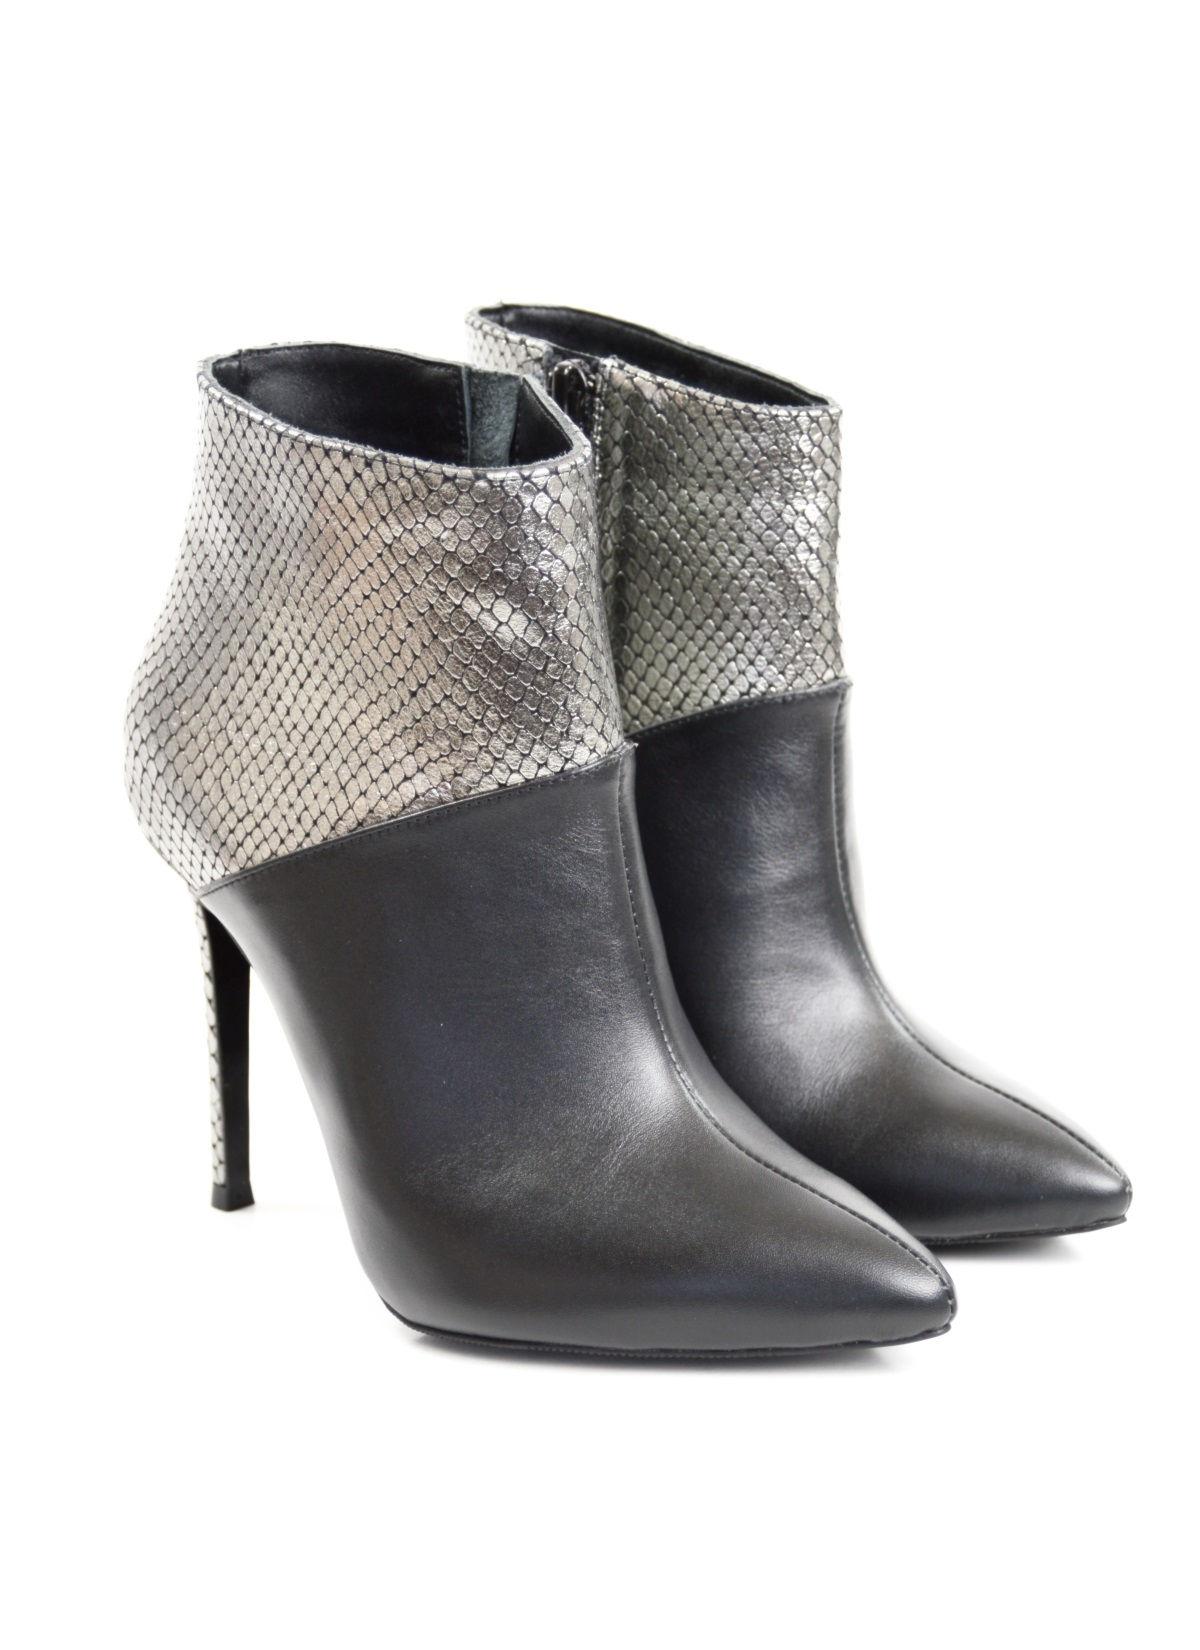 mai tarziu vânzare profesională arata bine vanzare pantofi Black & Silver Attitude Ankle Boots - Pantofi la comanda by Select ...